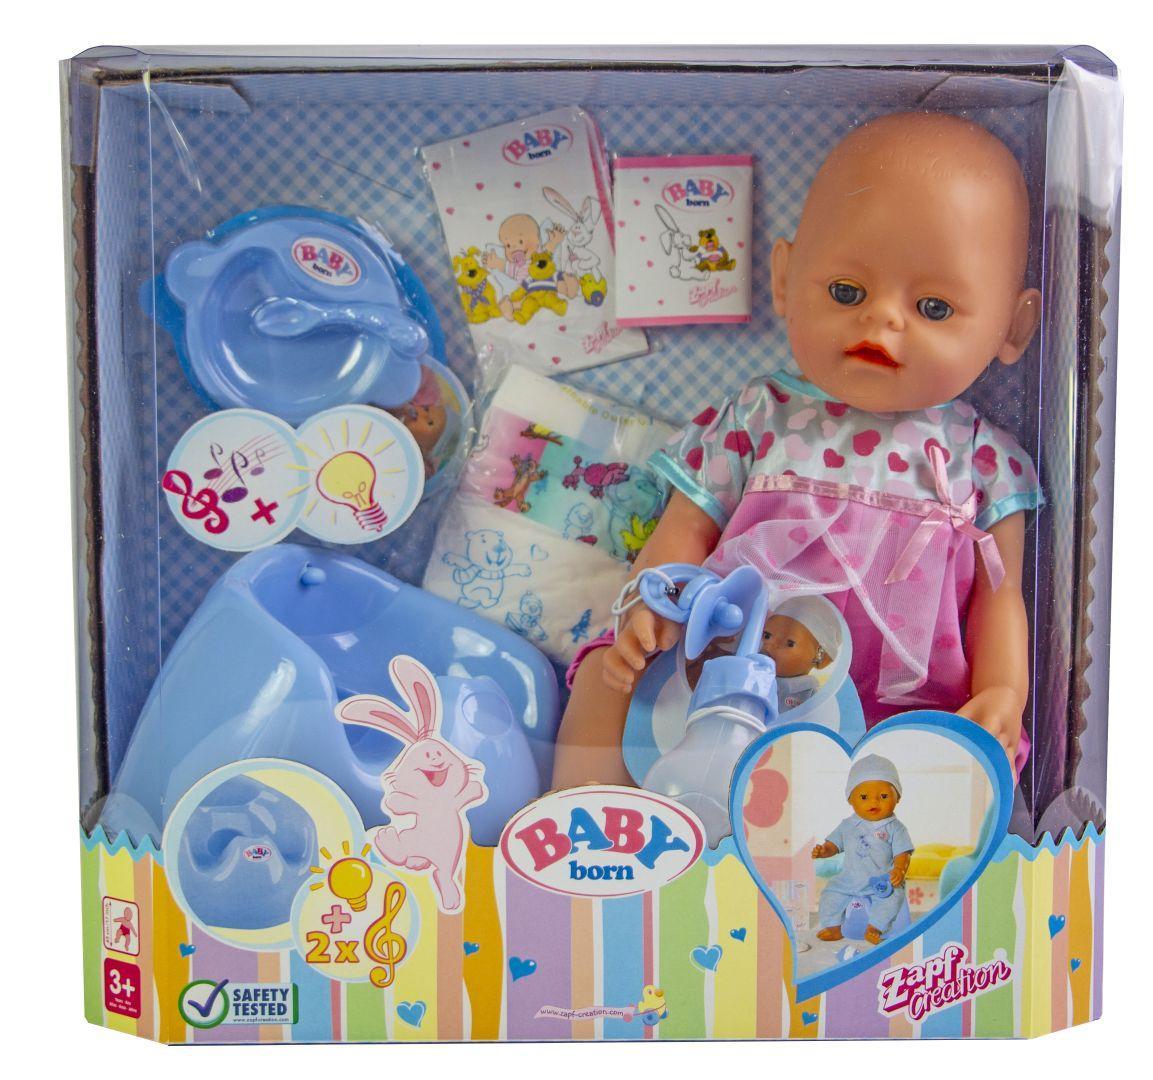 Кукла Baby Born (Бейби Борн) с аксессуарами, музыкальный горшок (К148)